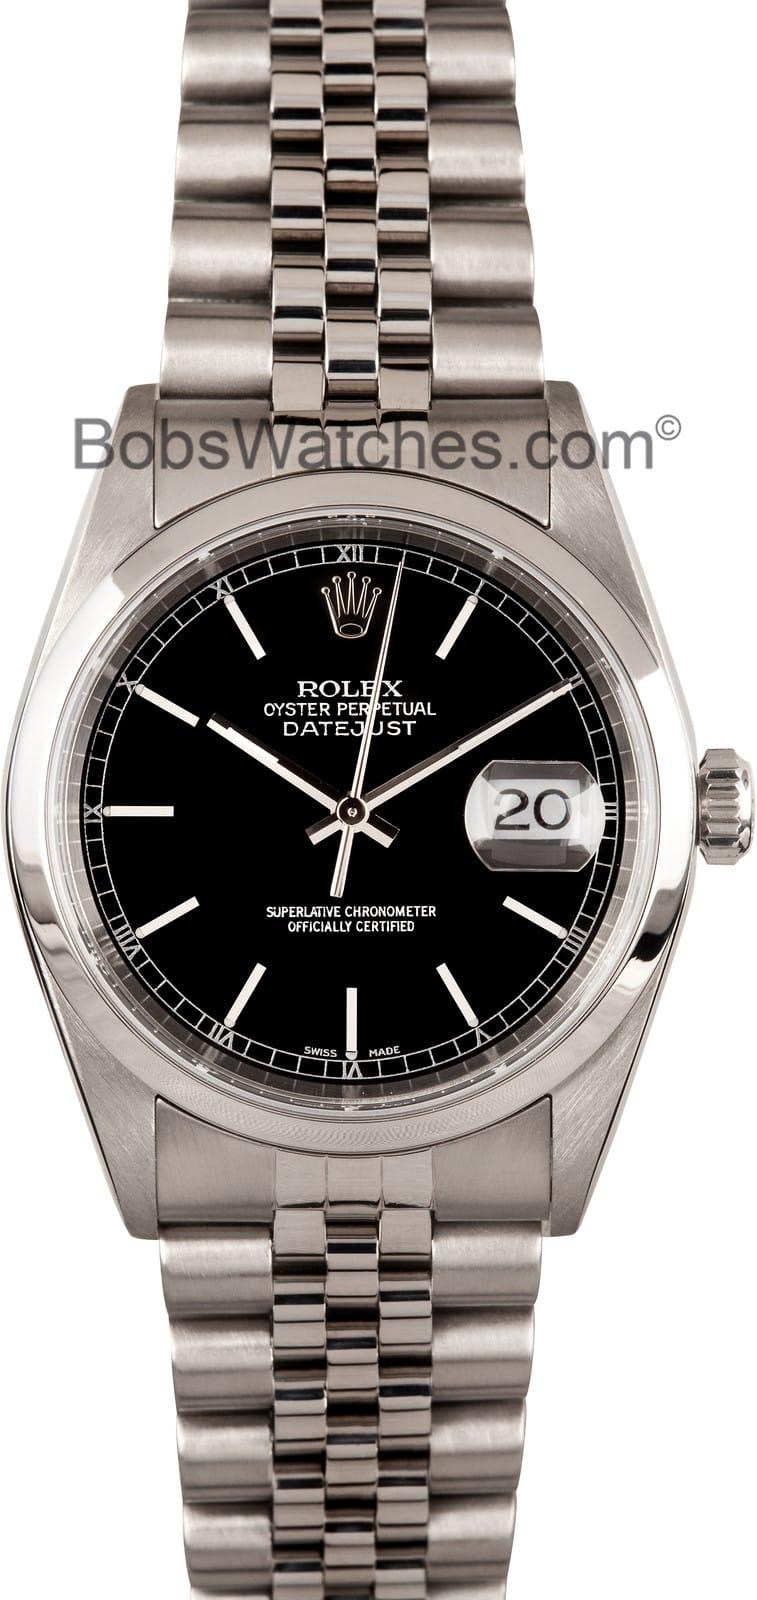 Used Rolex Daytona >> Men's Rolex Datejust Watch Black Dial White Ring 16200 - Save 35%